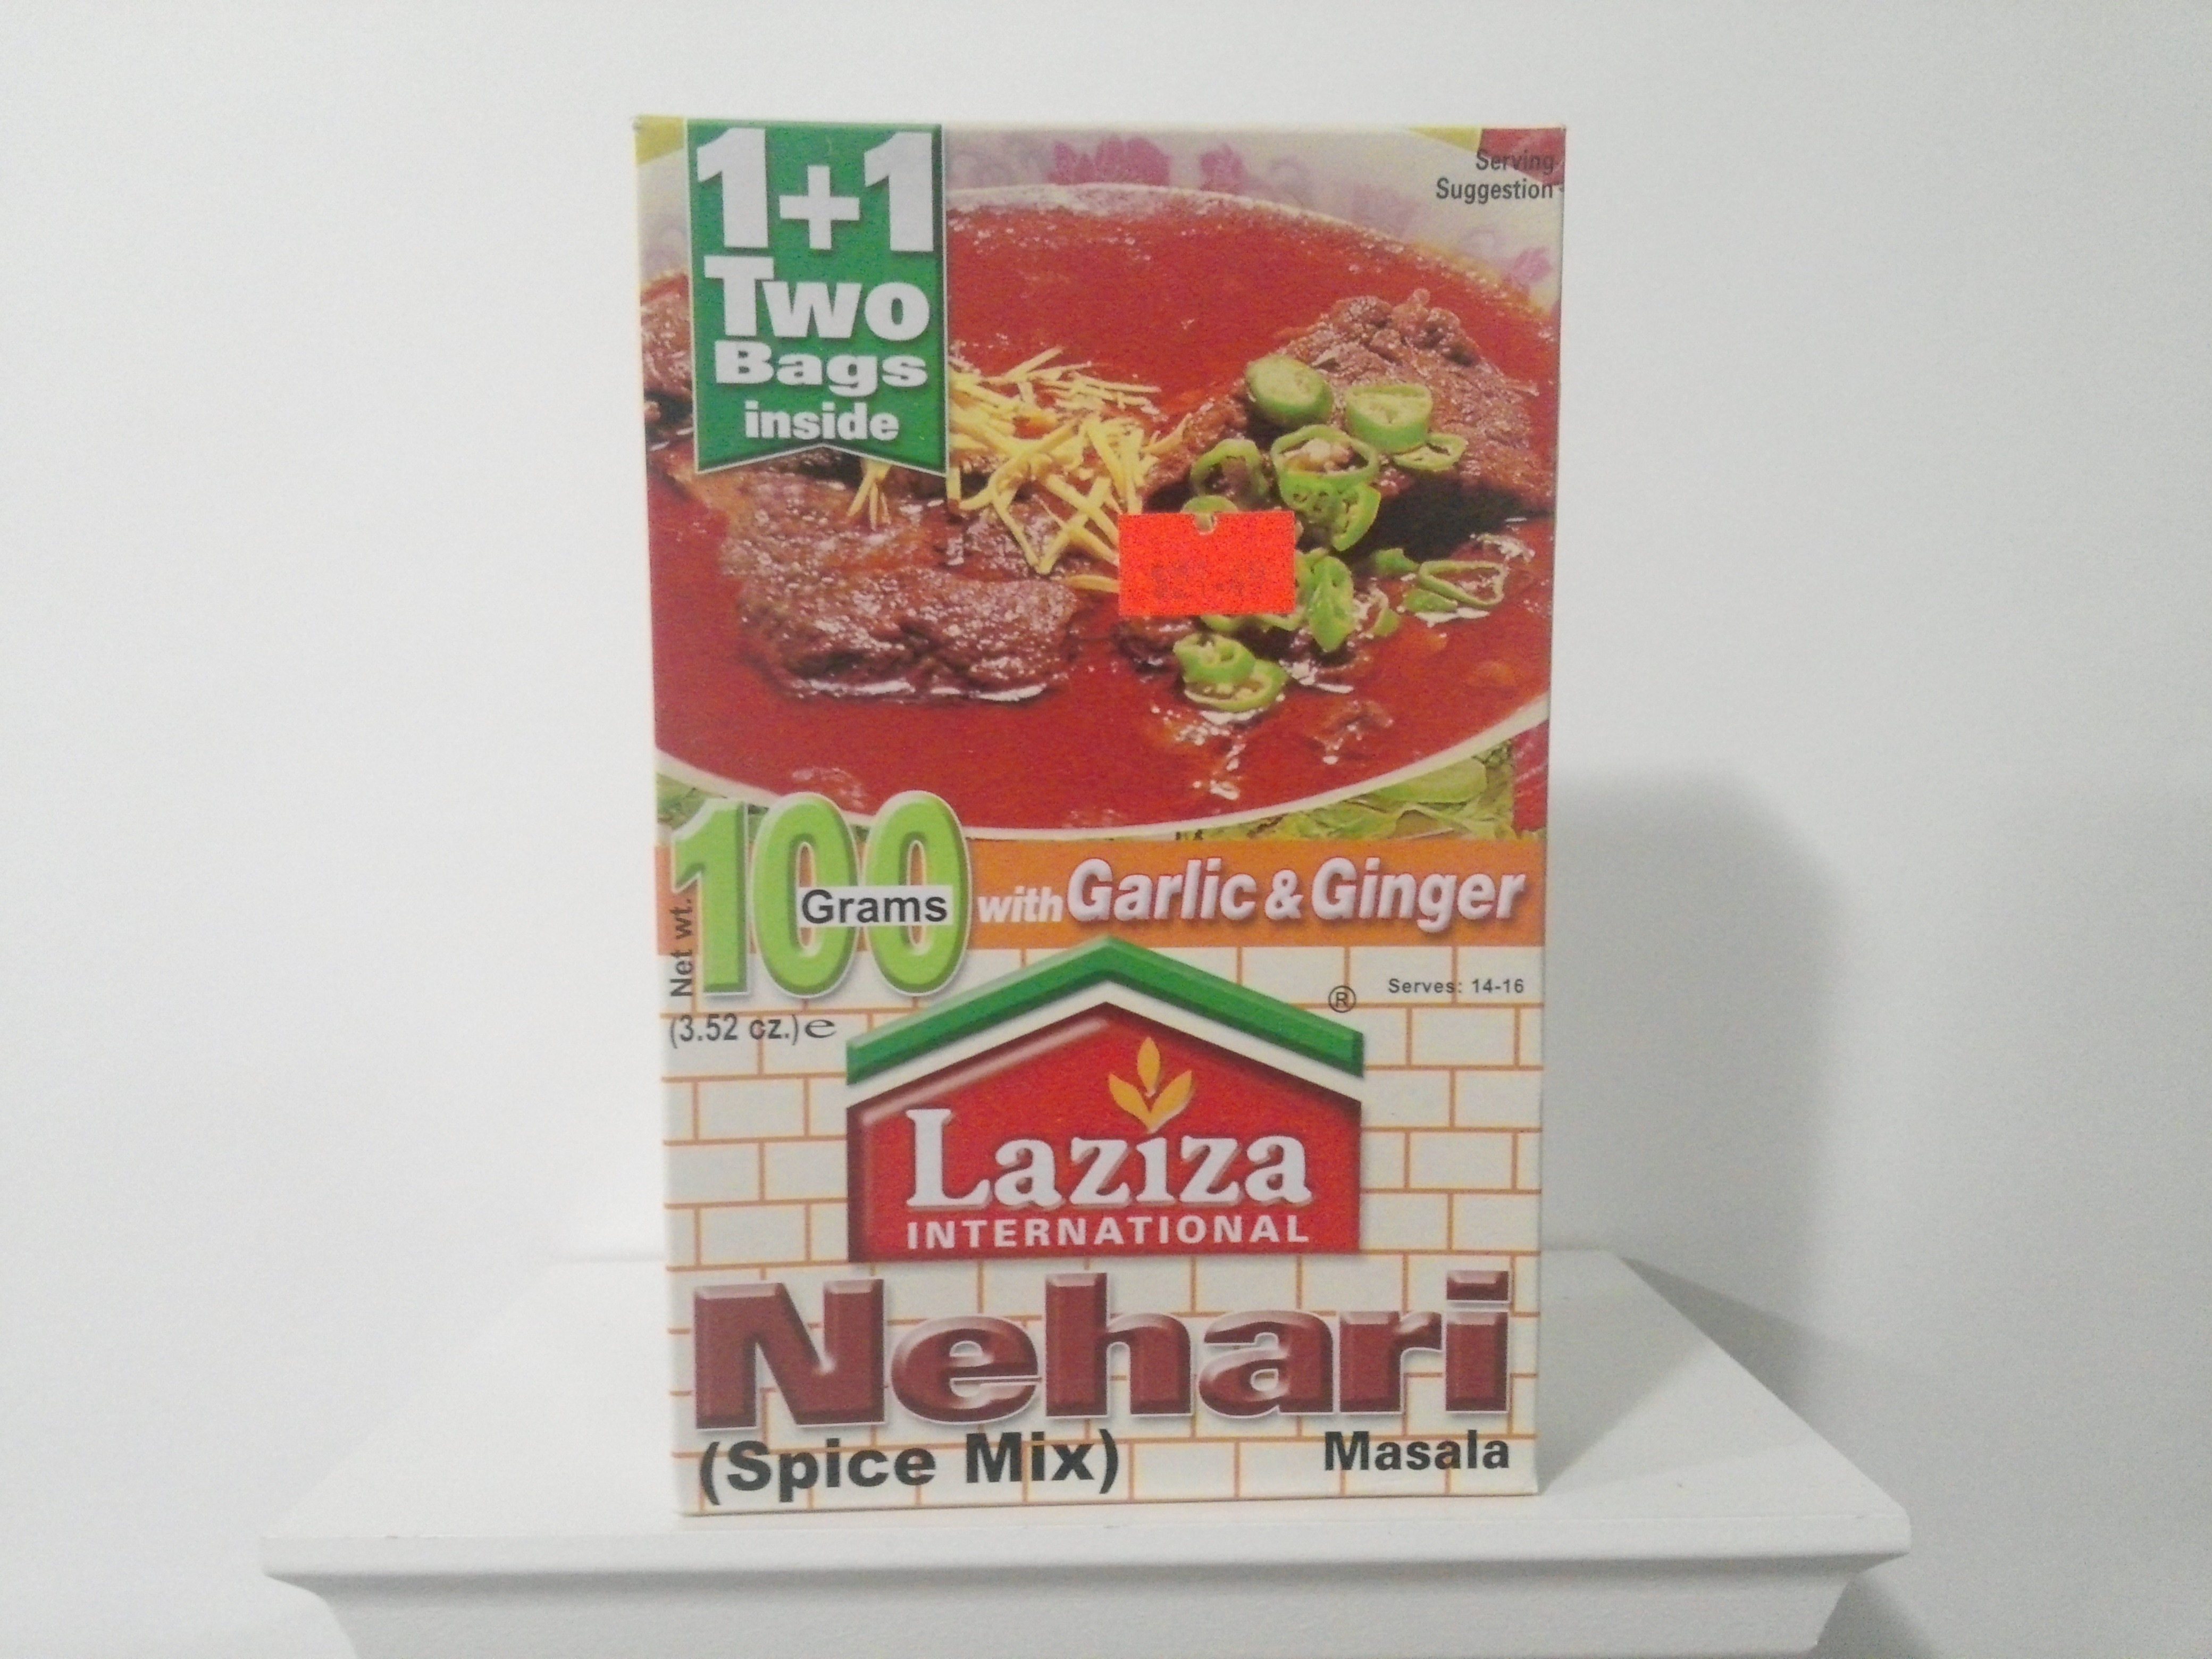 Laziza Nehari Spice Mix 100 grm